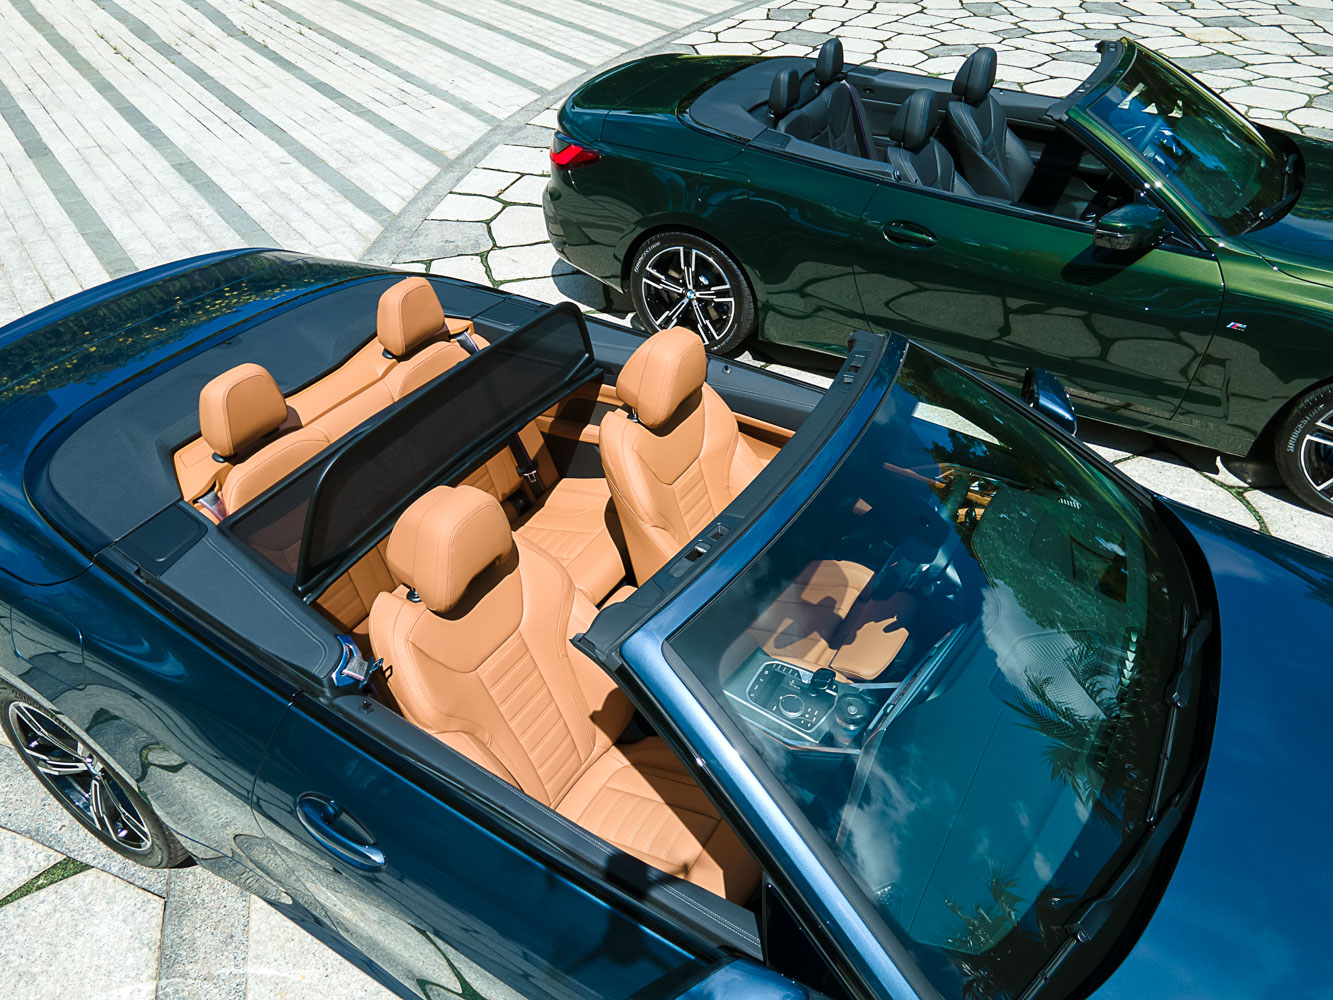 xe-BMW-4-Series-Convertible-ra-mat-anh_2.JPG